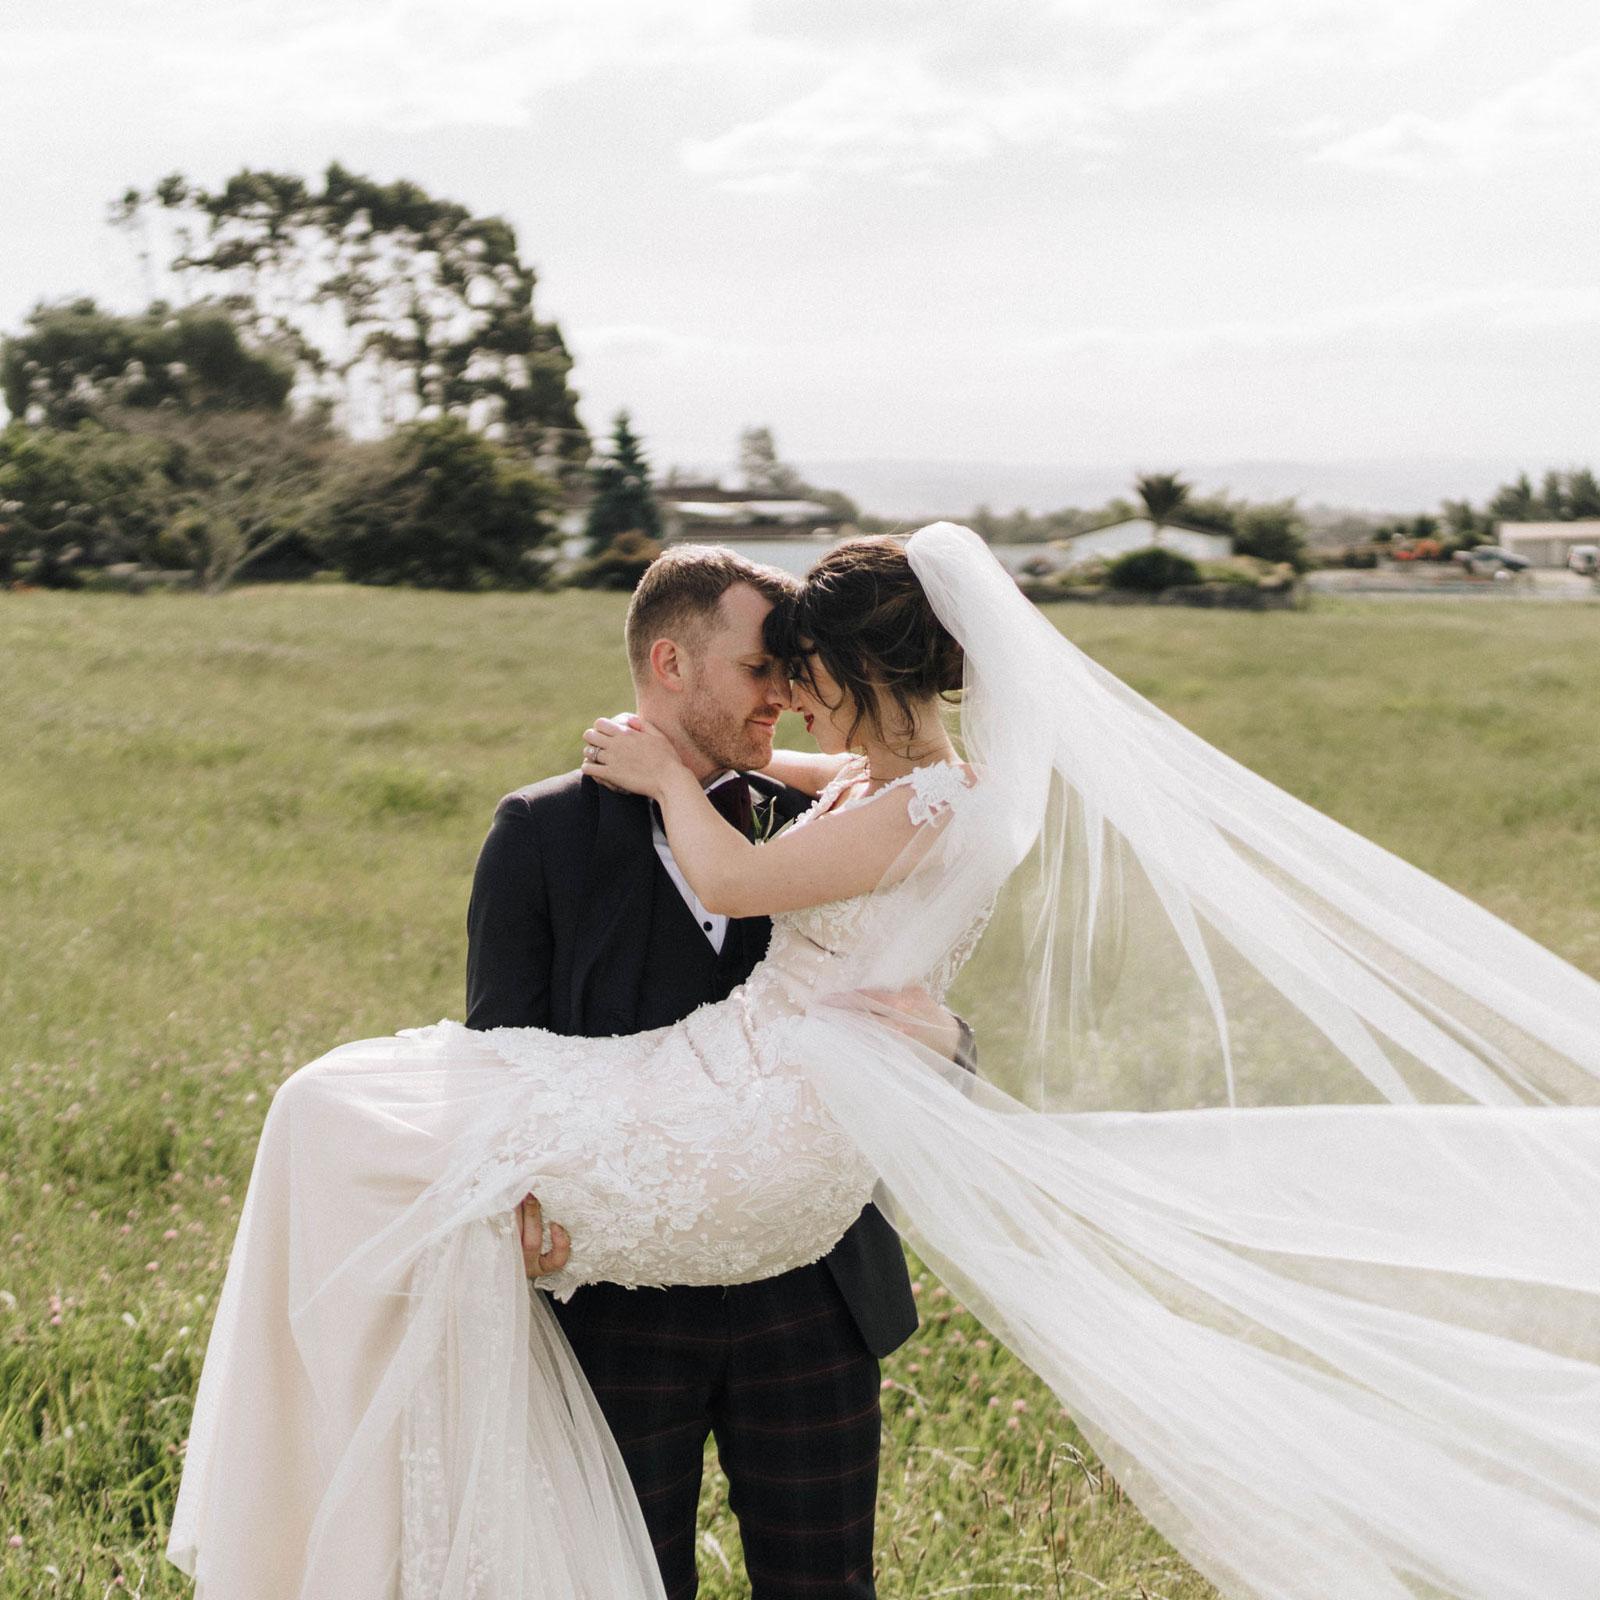 newfound-n-c-olive-tree-cottage-tauranga-wedding-photographer-724